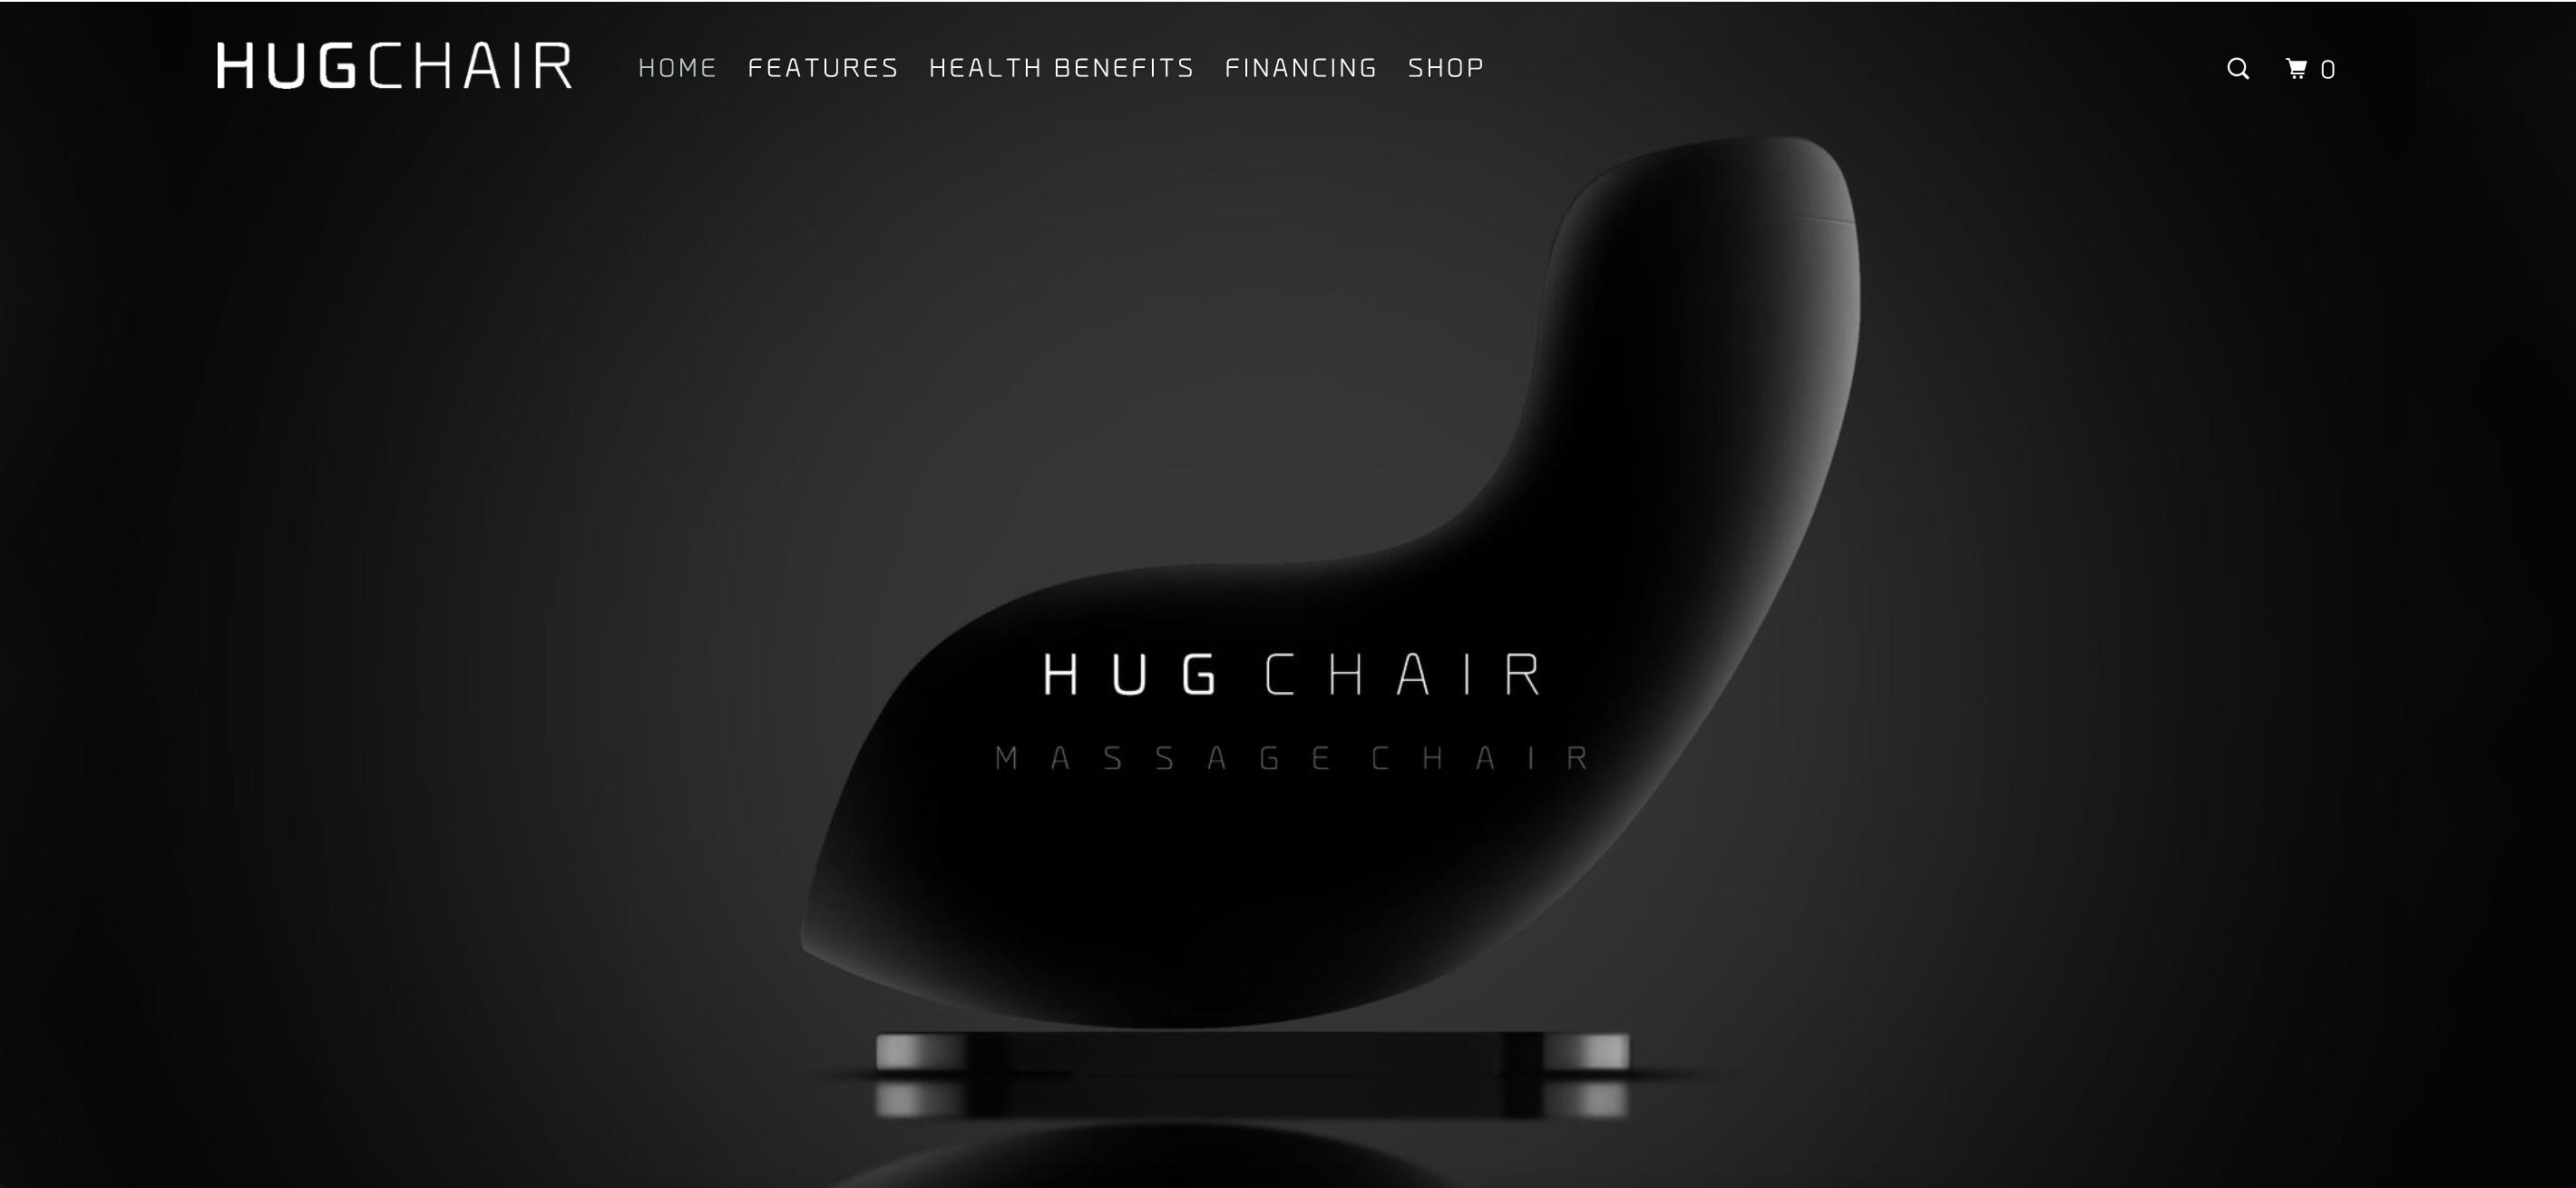 hug chairs bodyfriend company usa massage chairs web design website development los angeles